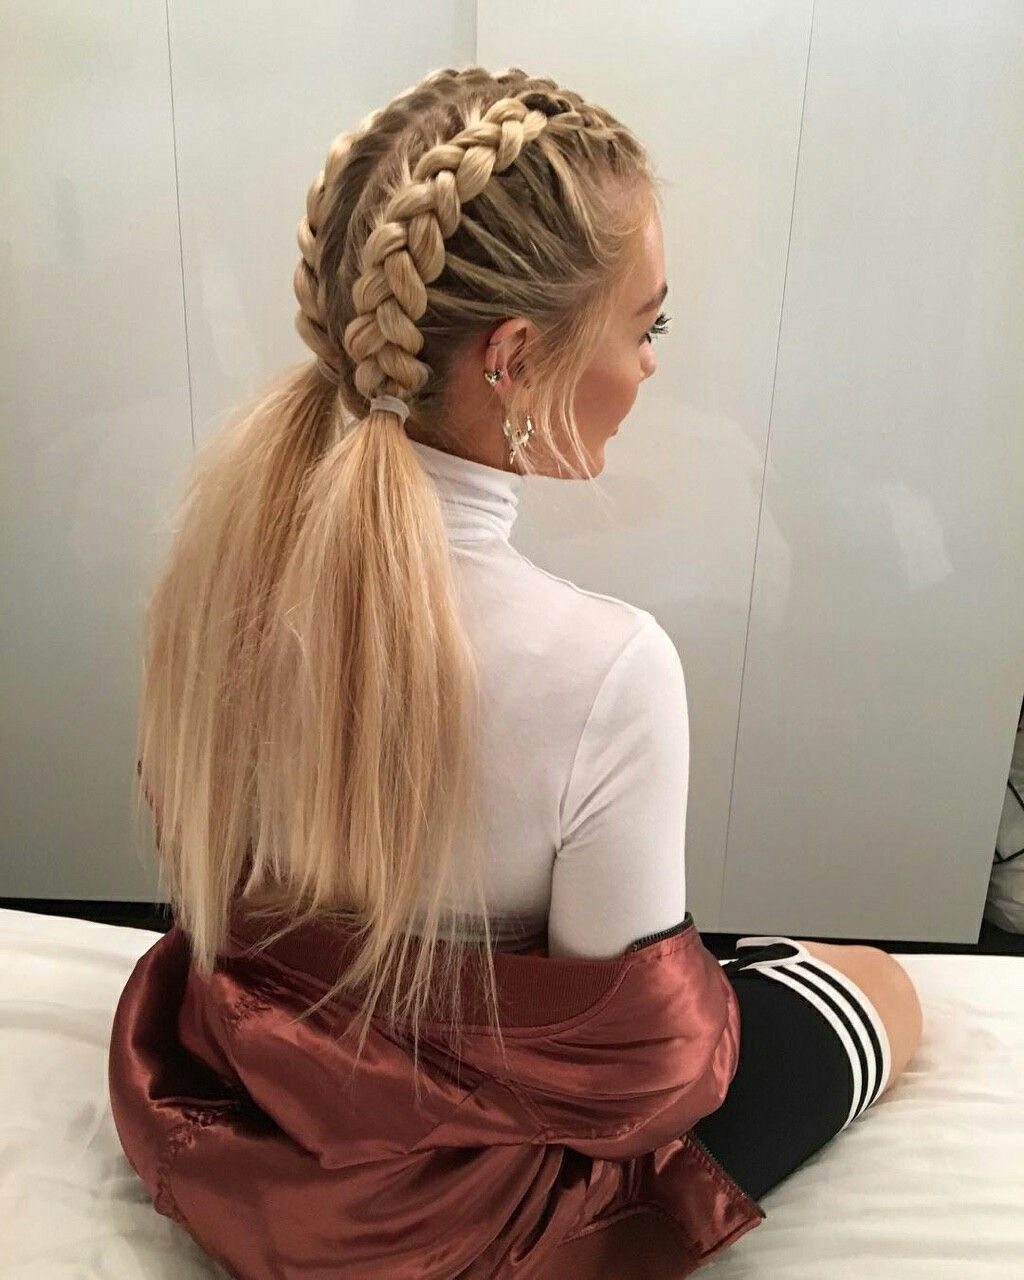 Hairstyles Plaits Braids: Braided Hairstyles, Long Hair Styles